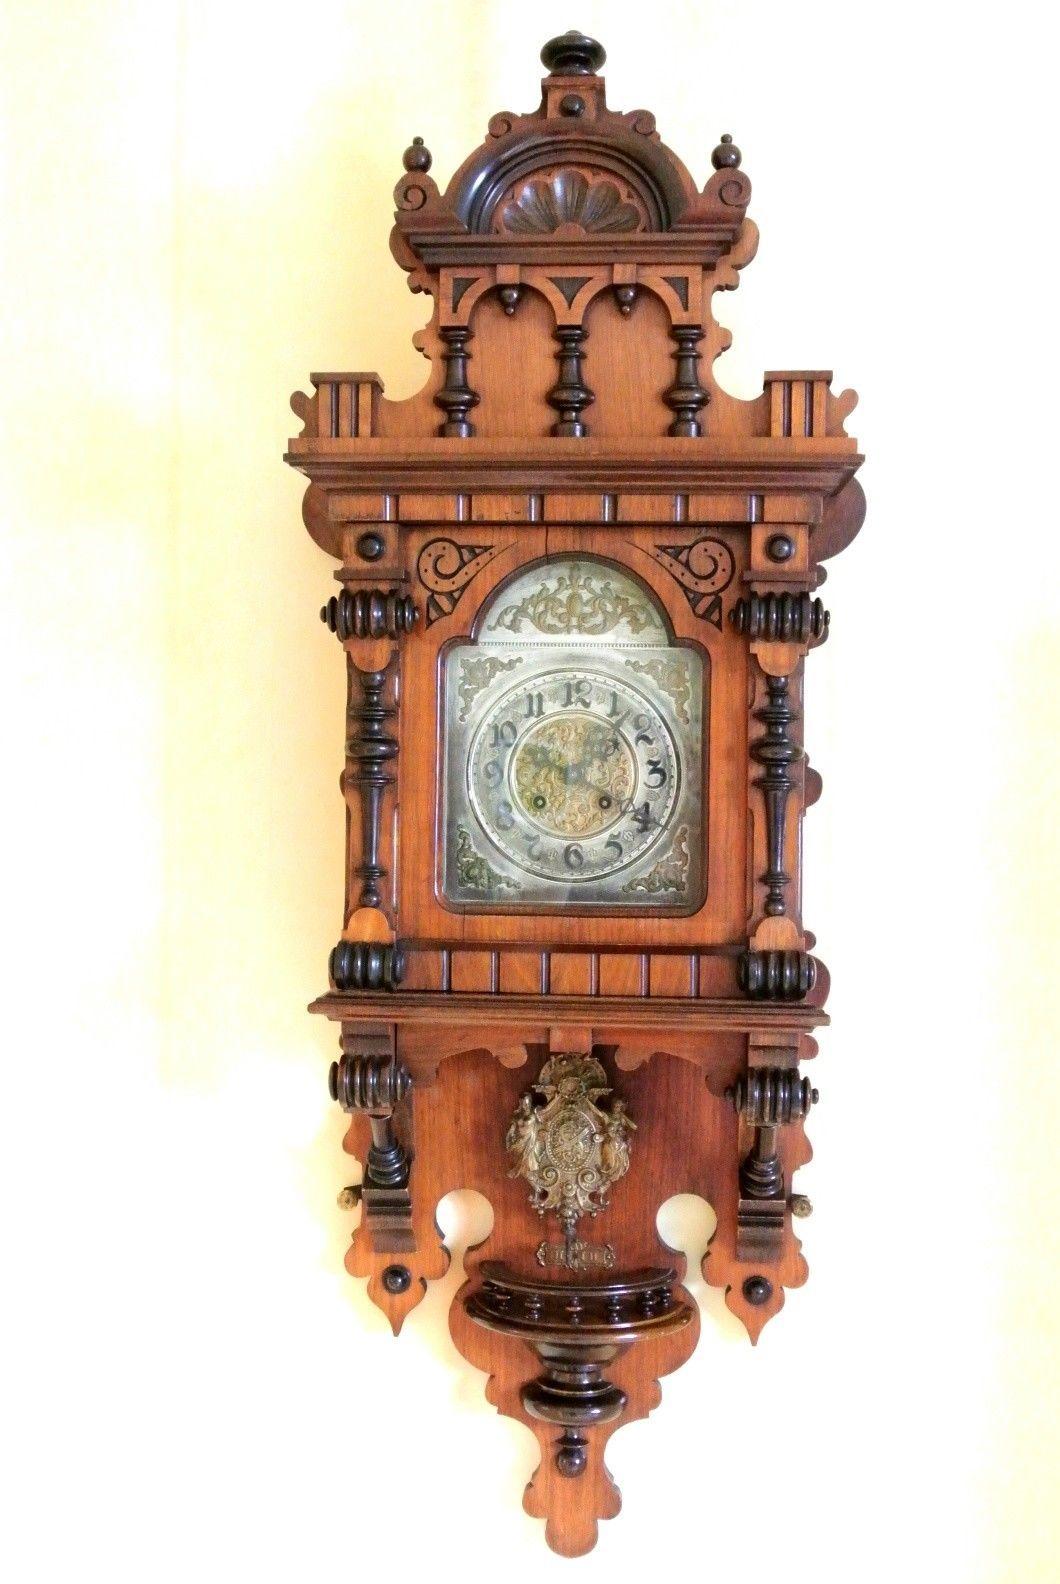 Gustav Becker Wanduhr Ca 1897 Regulator Freischwinger Pendeluhr Schlagwerk 118cm Antiquitaten Kunst Mobiliar Antique Clocks Antique Wall Clock Wall Clock